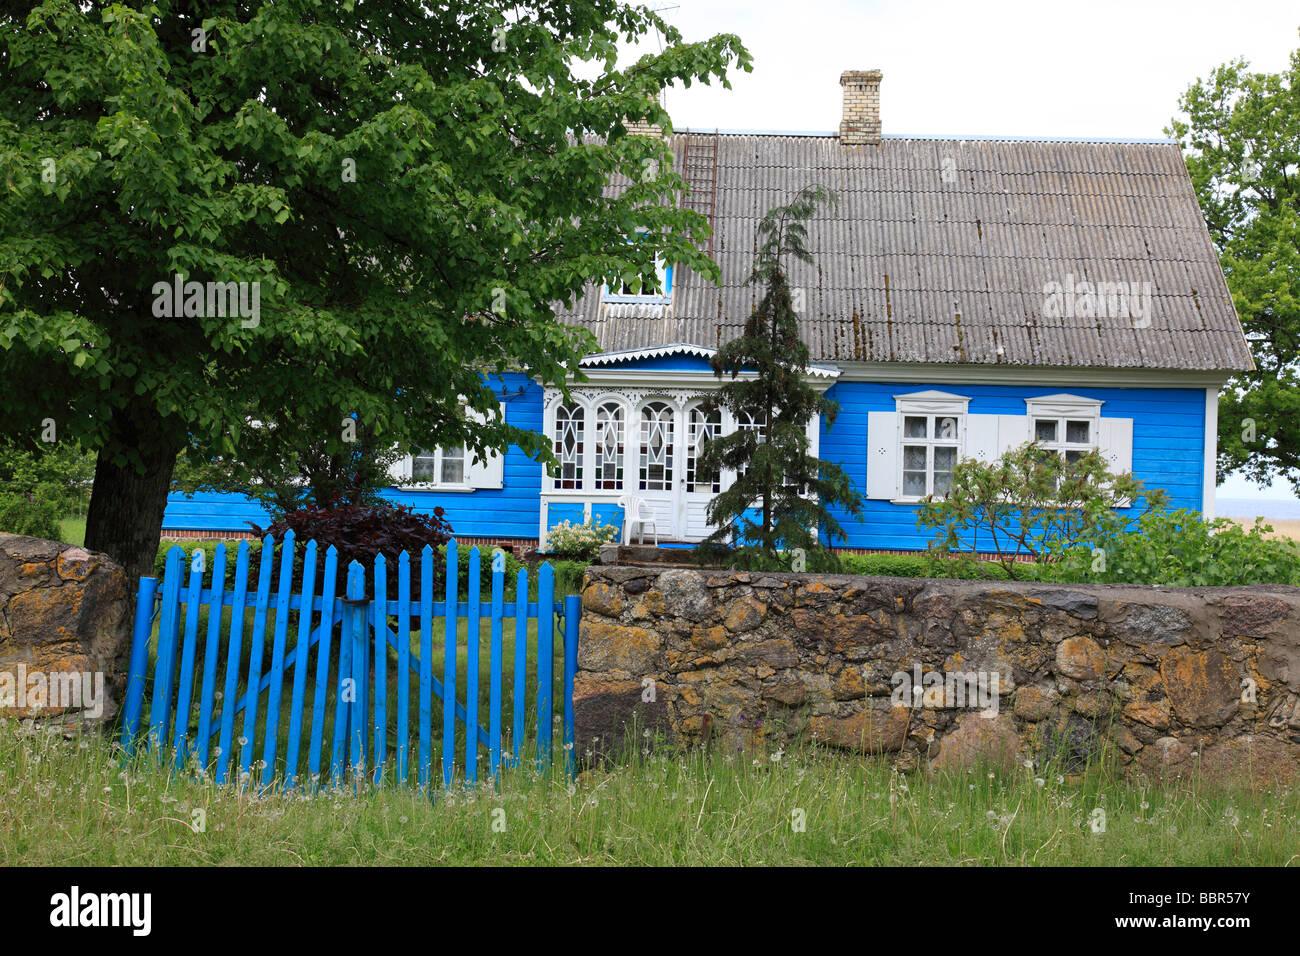 estonaina summerhouse at the boarder of Latvia, Estonia, Baltic Nation. Photo by Willy Matheisl - Stock Image